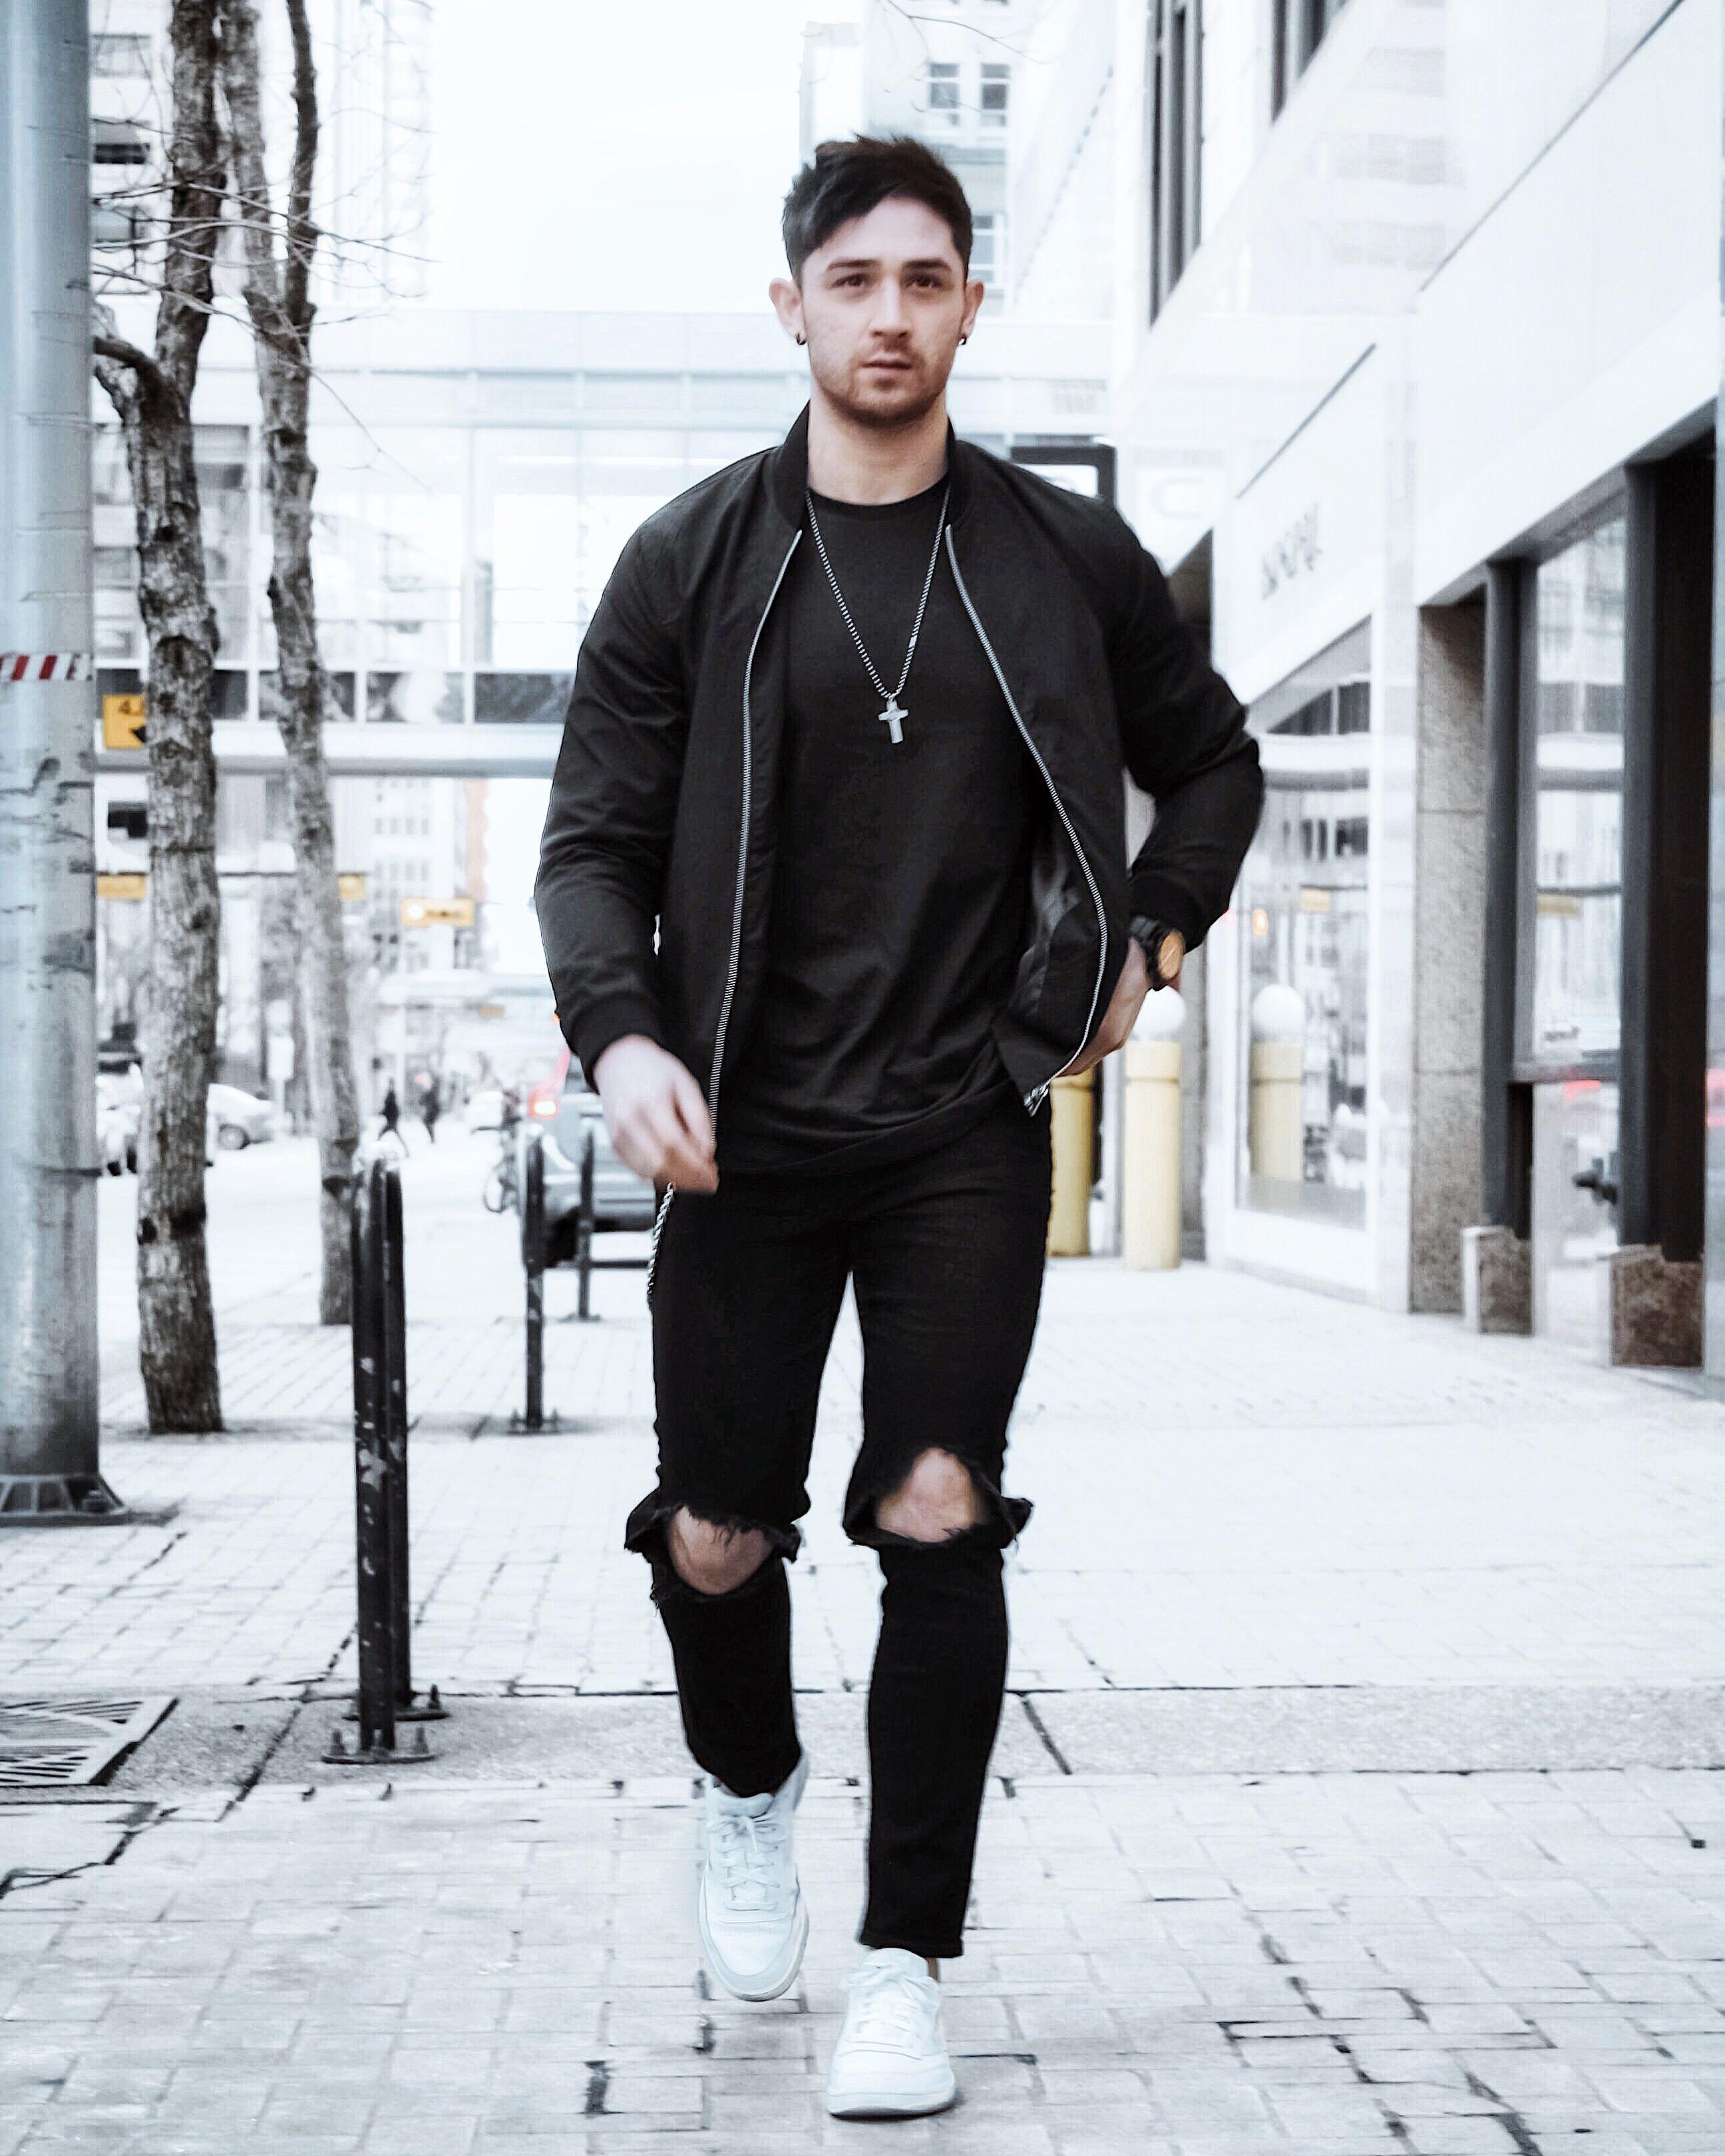 Instagramblogger Men Street Fashion Black Outfit Men Streetwear Inspiration [ 3240 x 2592 Pixel ]